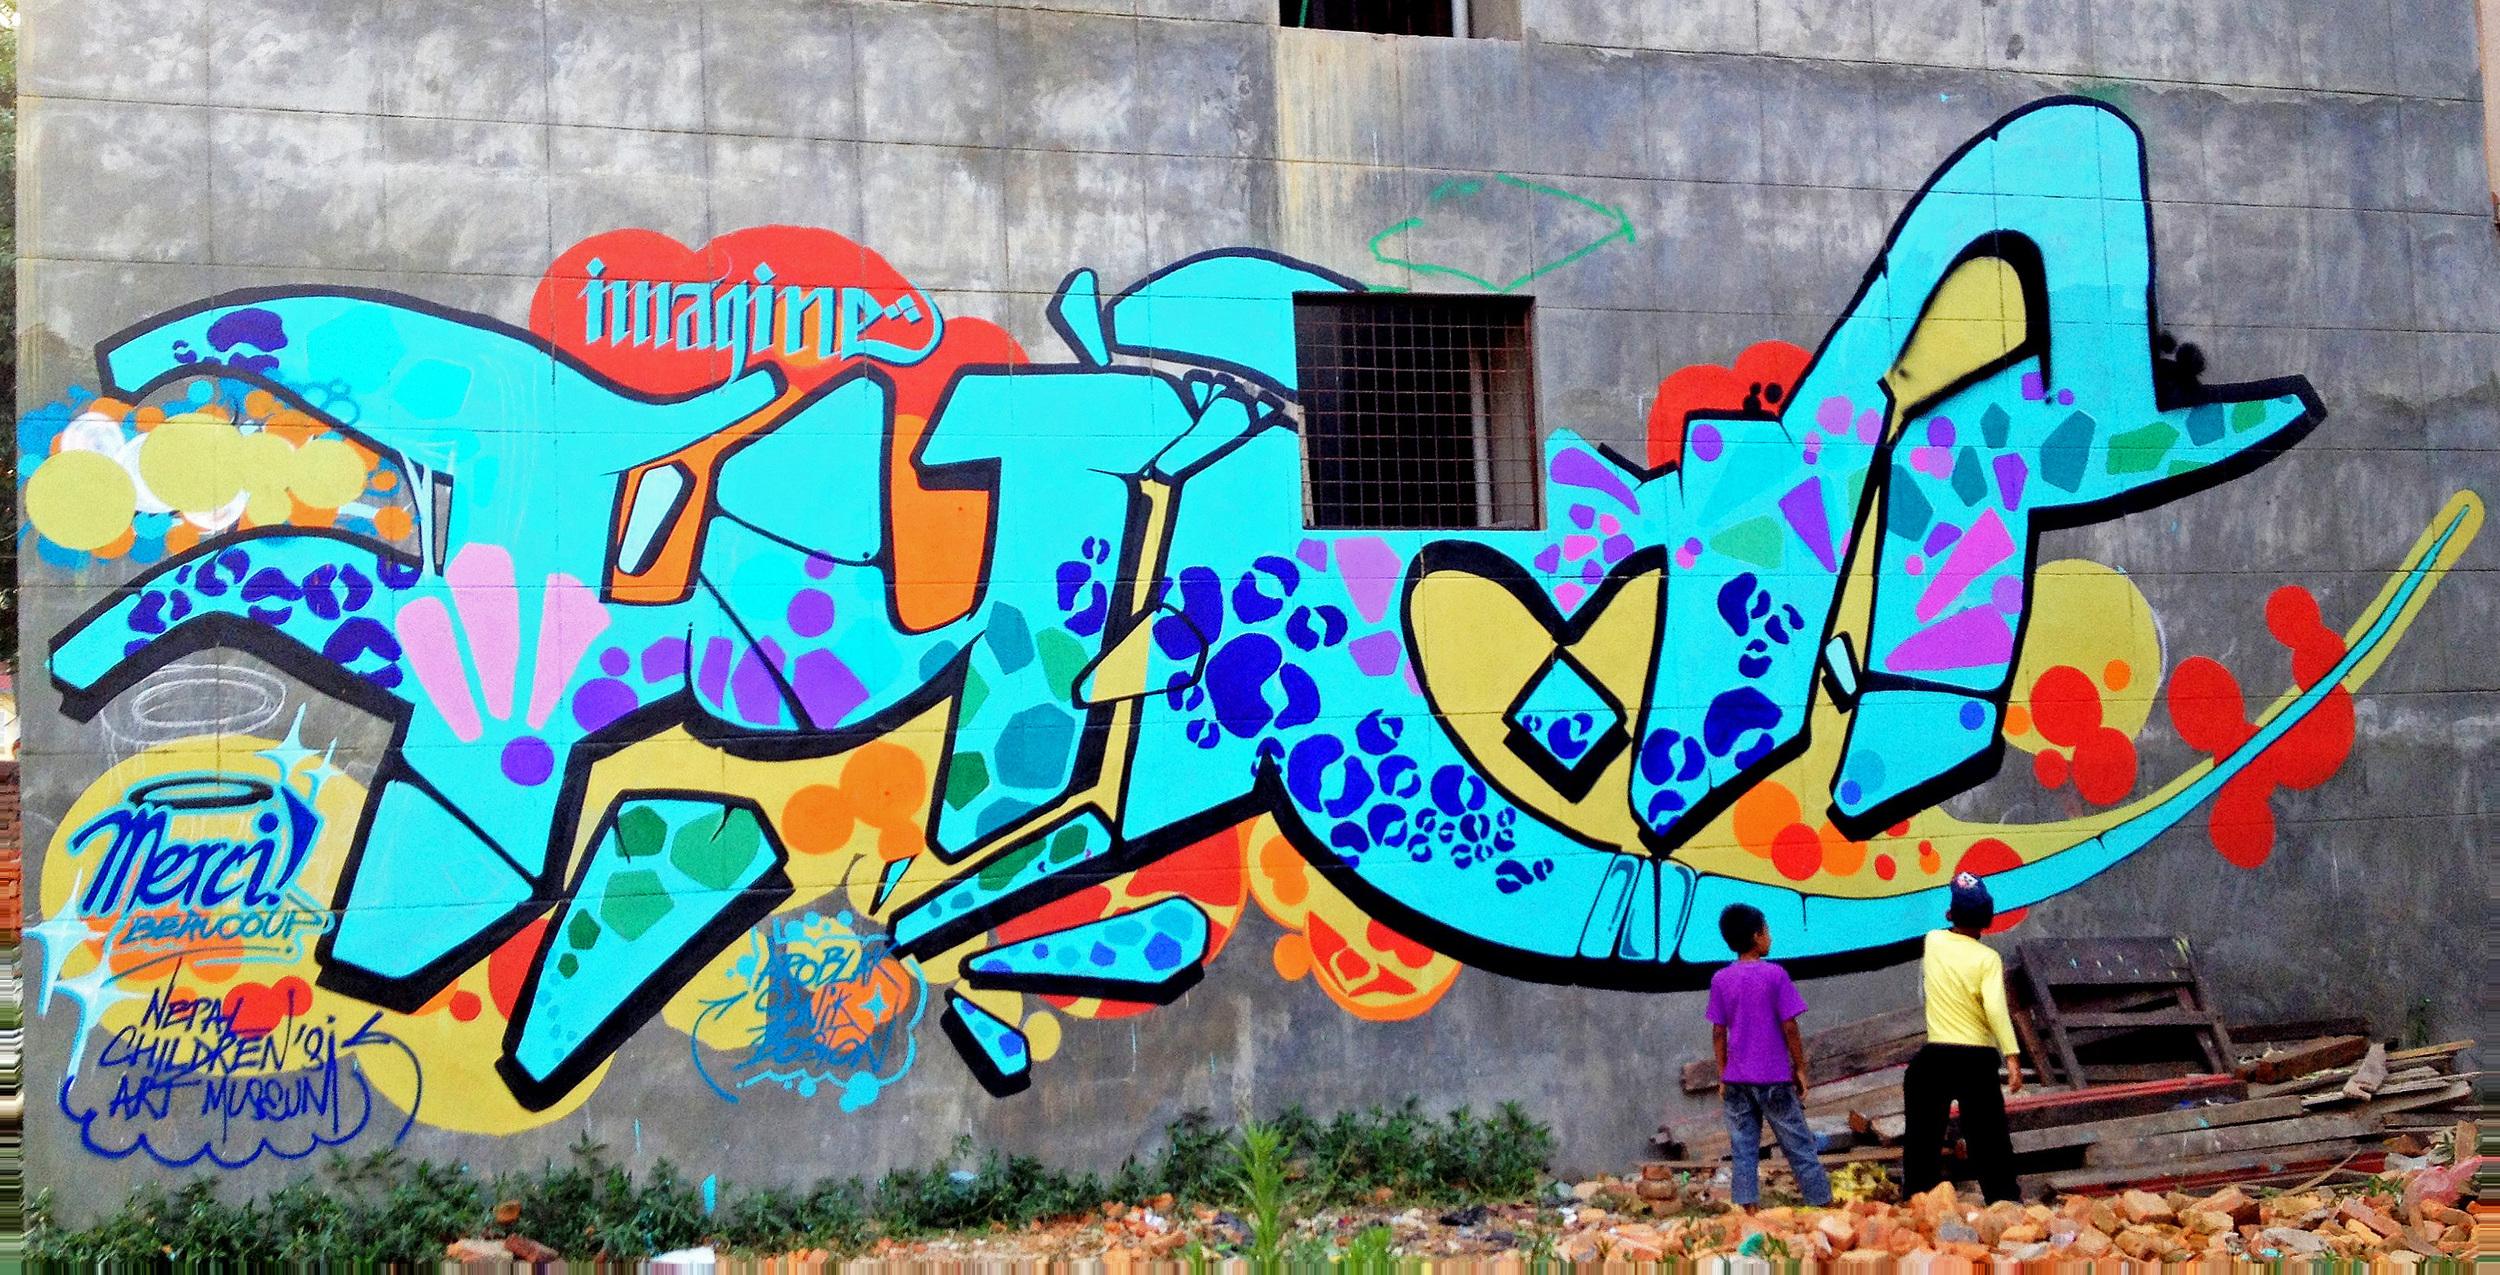 Merci, Nepal, 2014